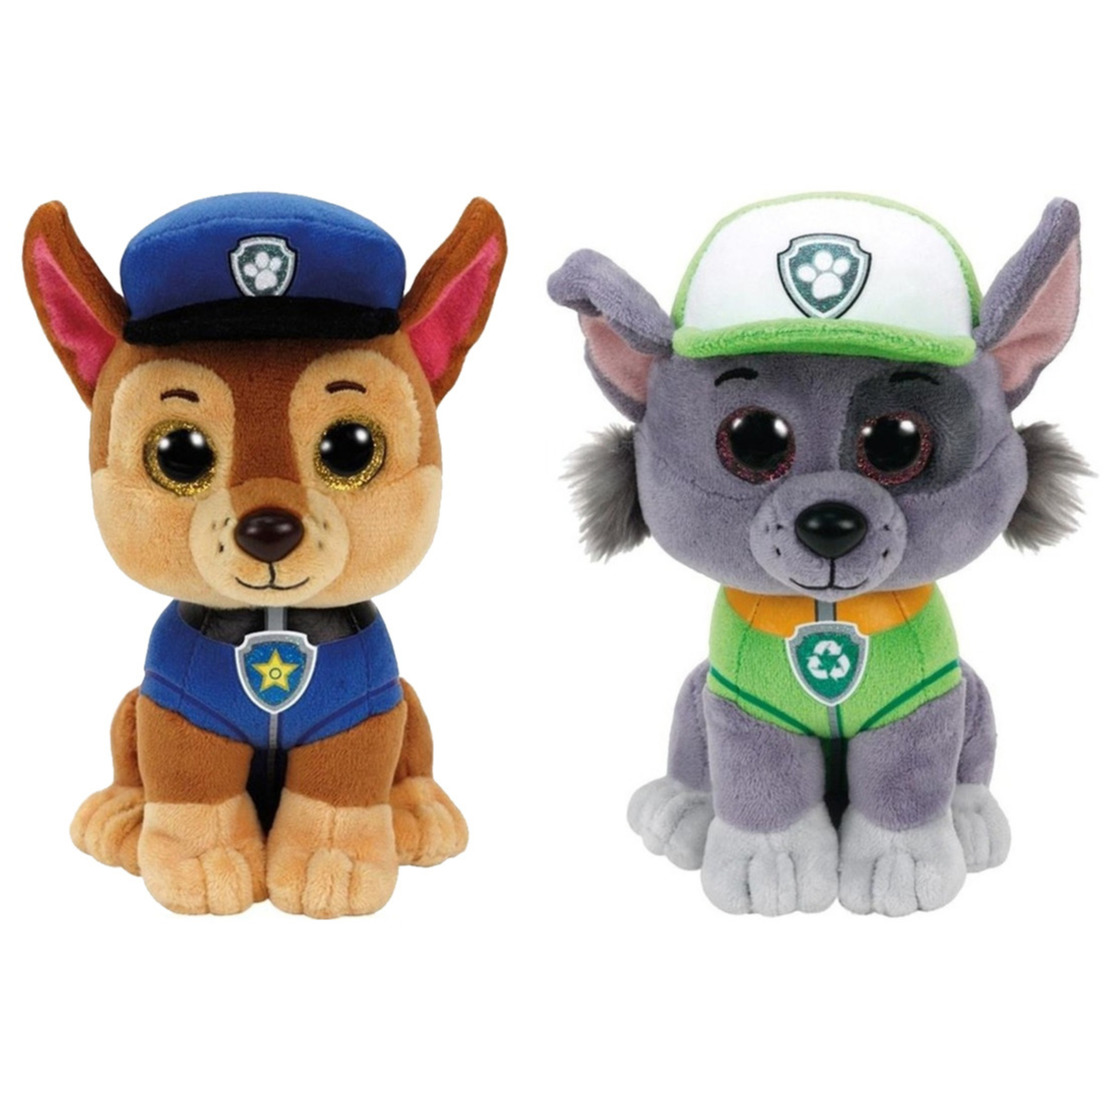 Paw patrol knuffels set van 2x karakters chase en rocky 15 cm